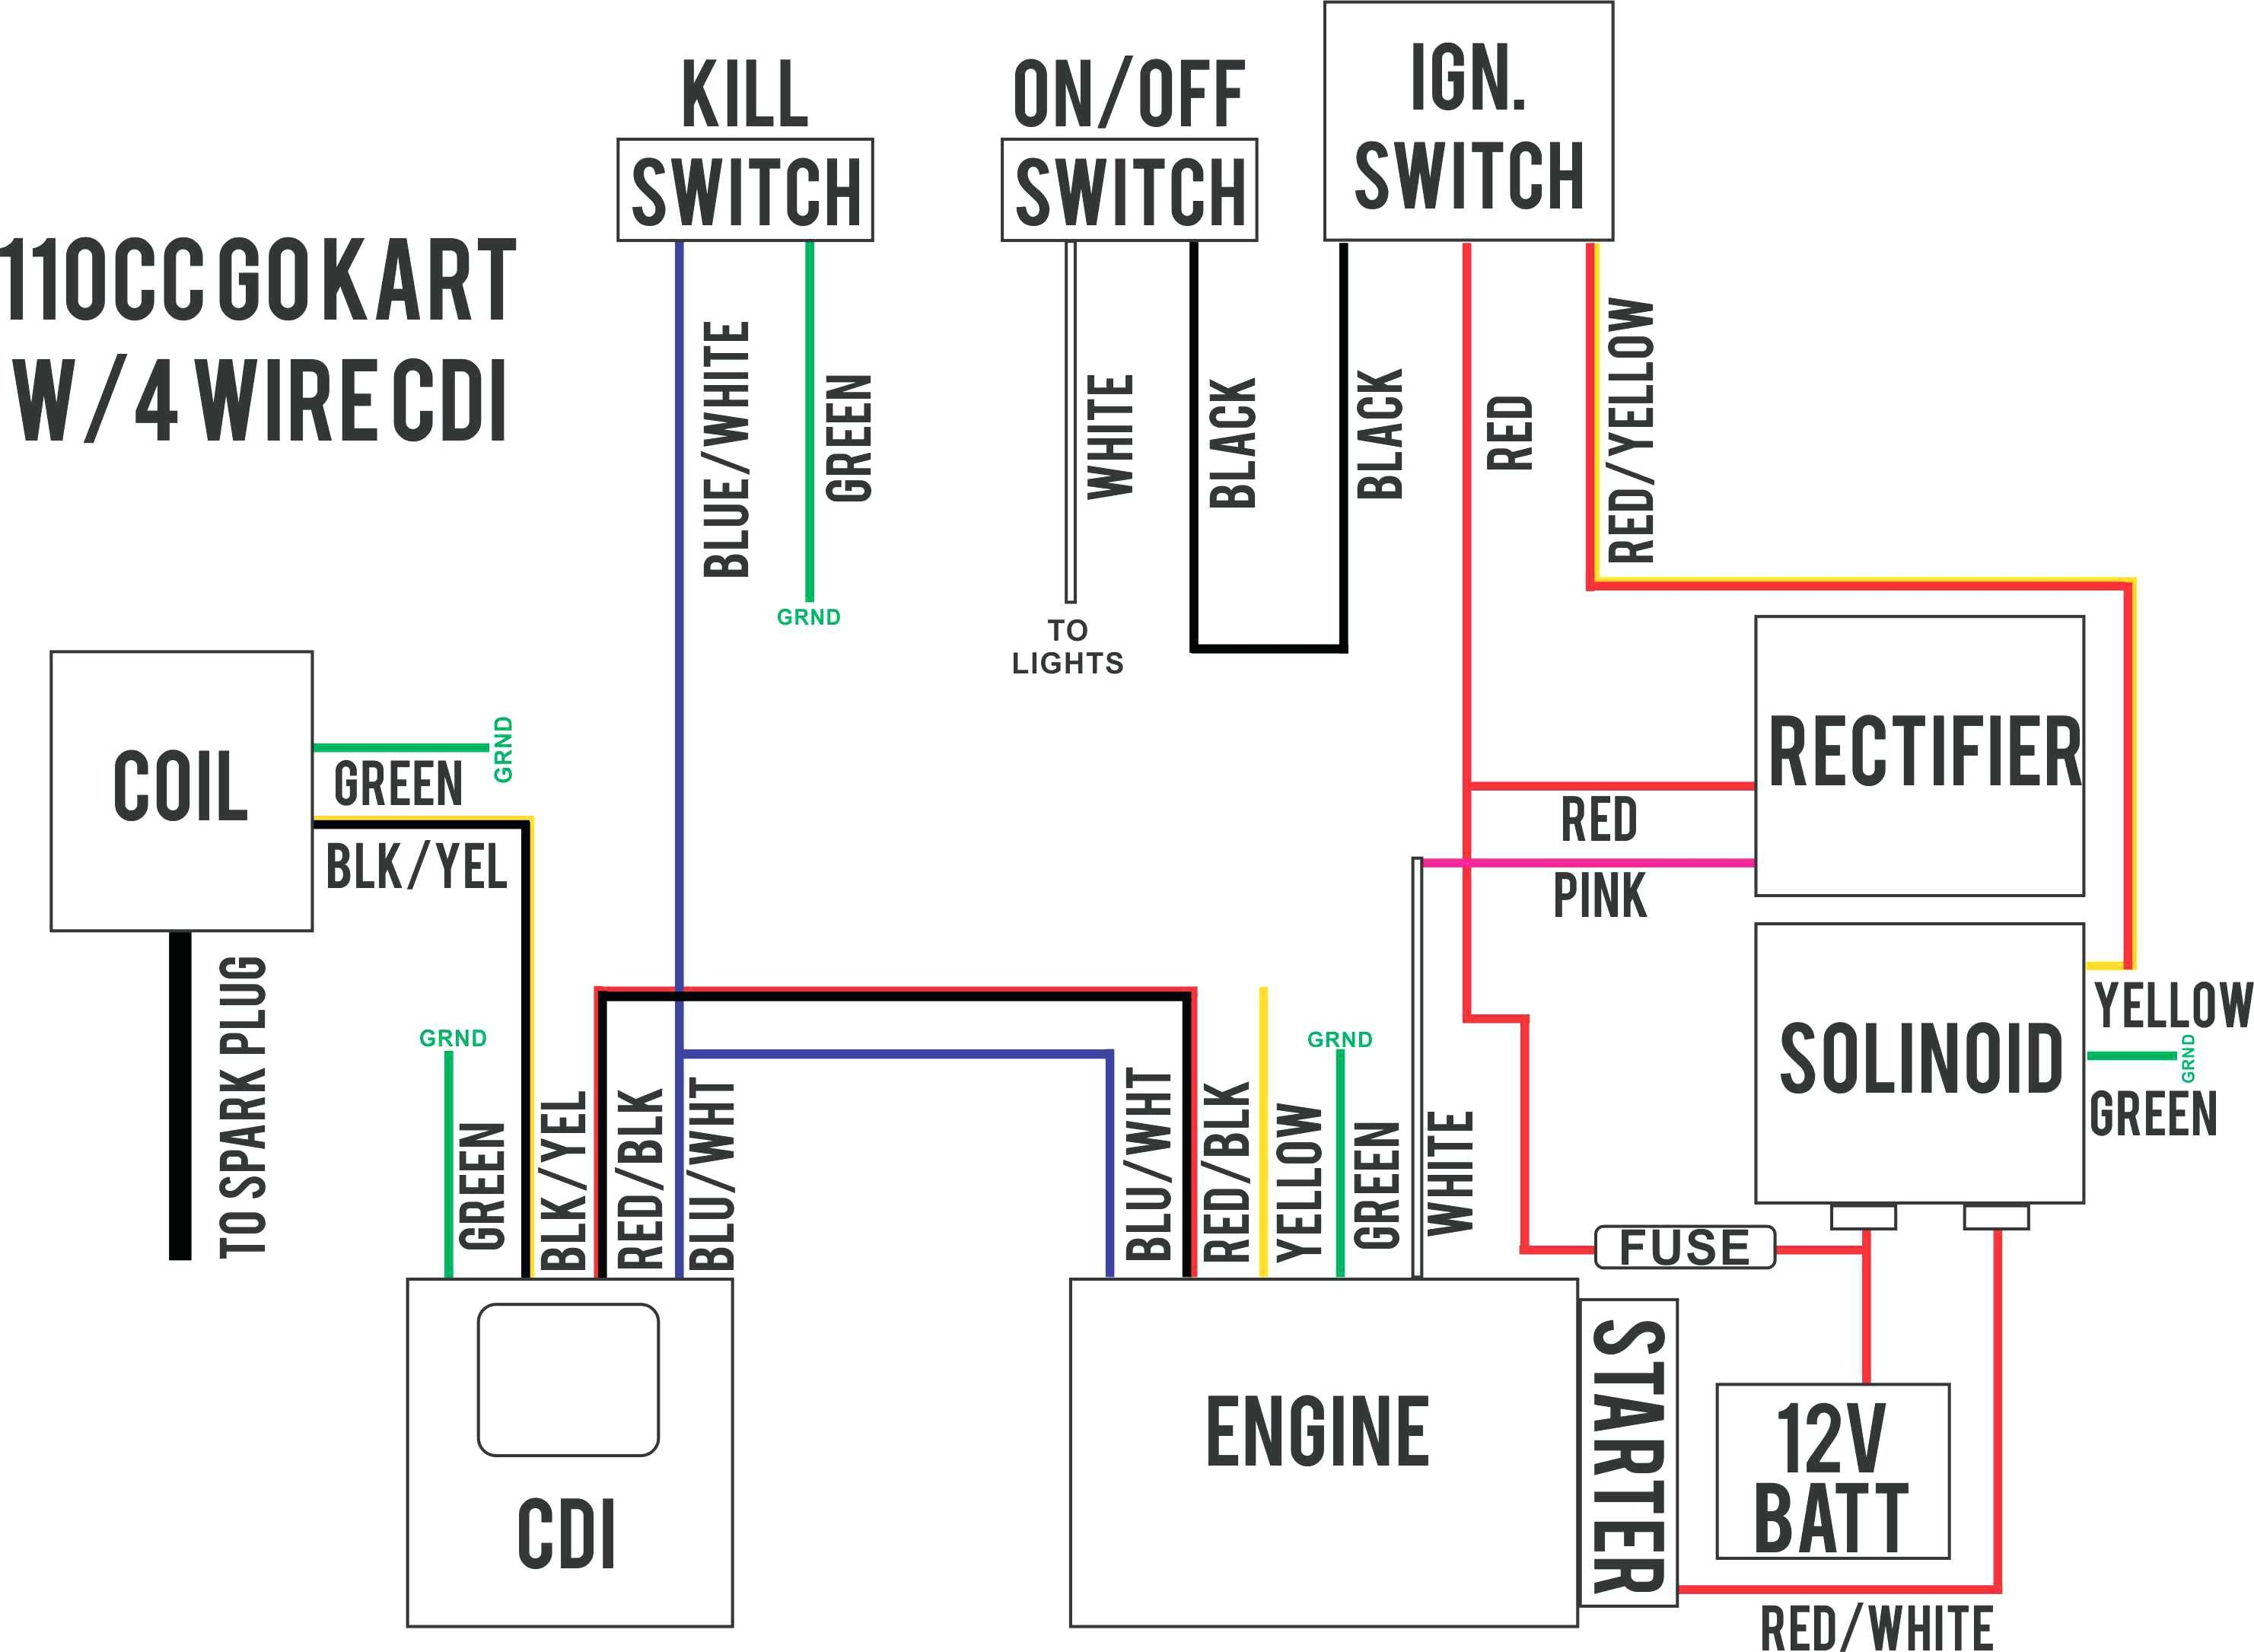 kenwood kdc 108 car stereo wiring diagram chinese atv bt852hd medium resolution of 248u harness inspiration